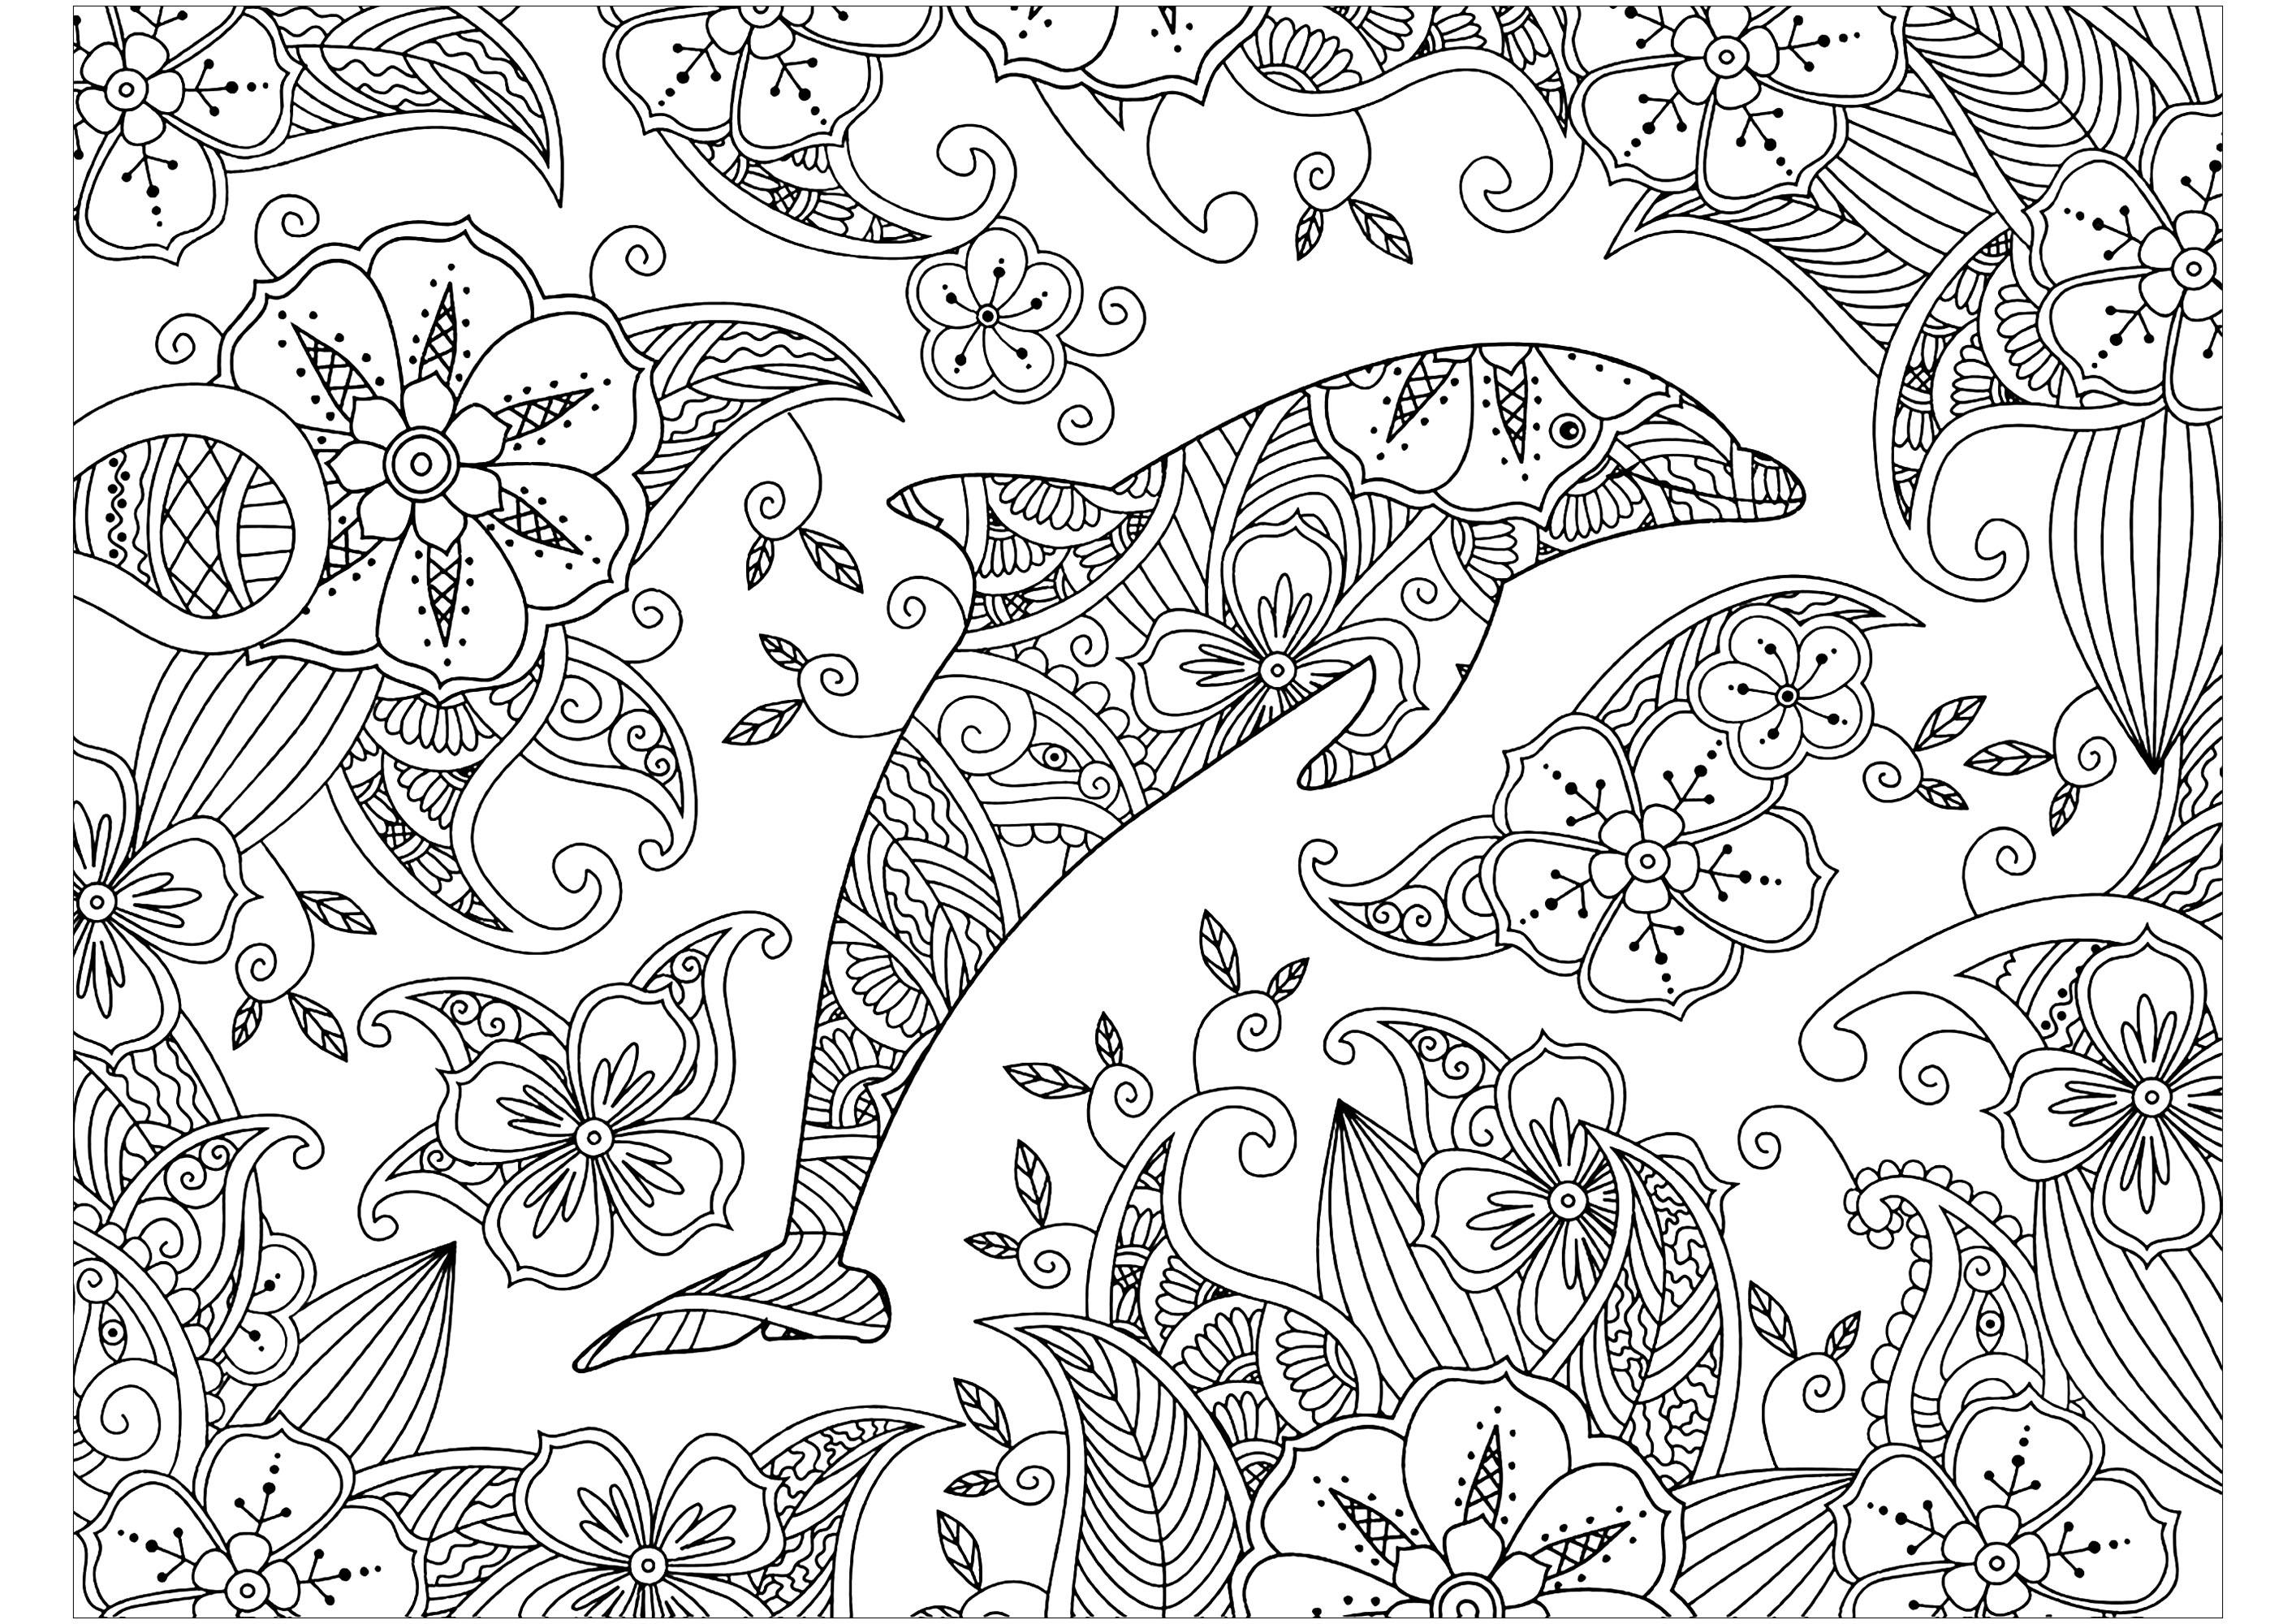 Coloriage Dauphin | Coloriage tout Coloriage Dauphin En Ligne